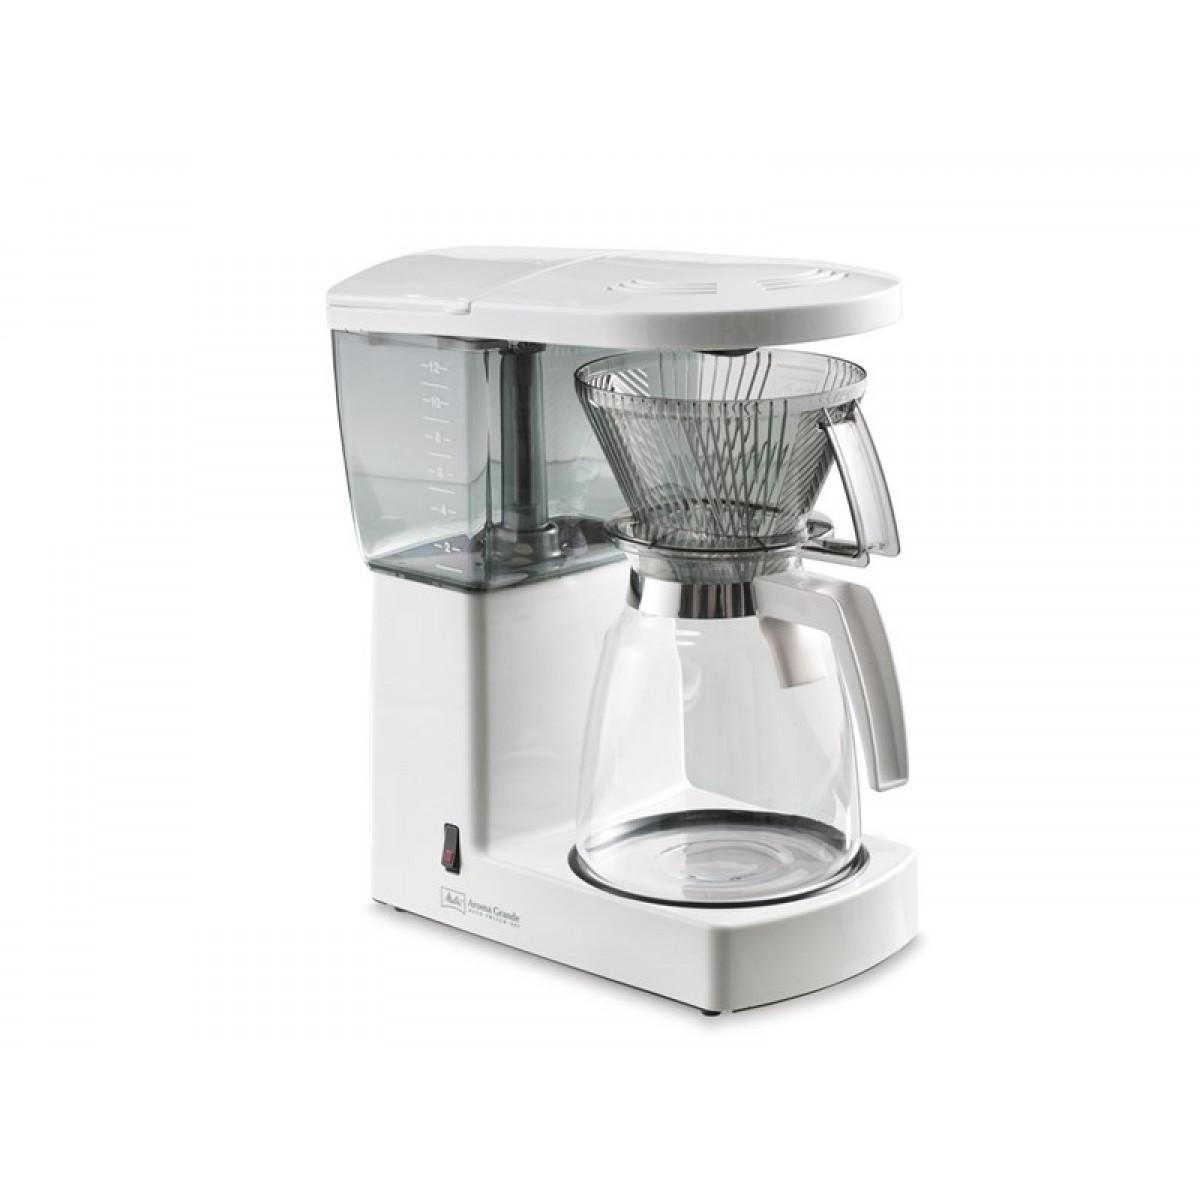 MELITTA Kaffemaskine excellent grande 12 kopper hvid